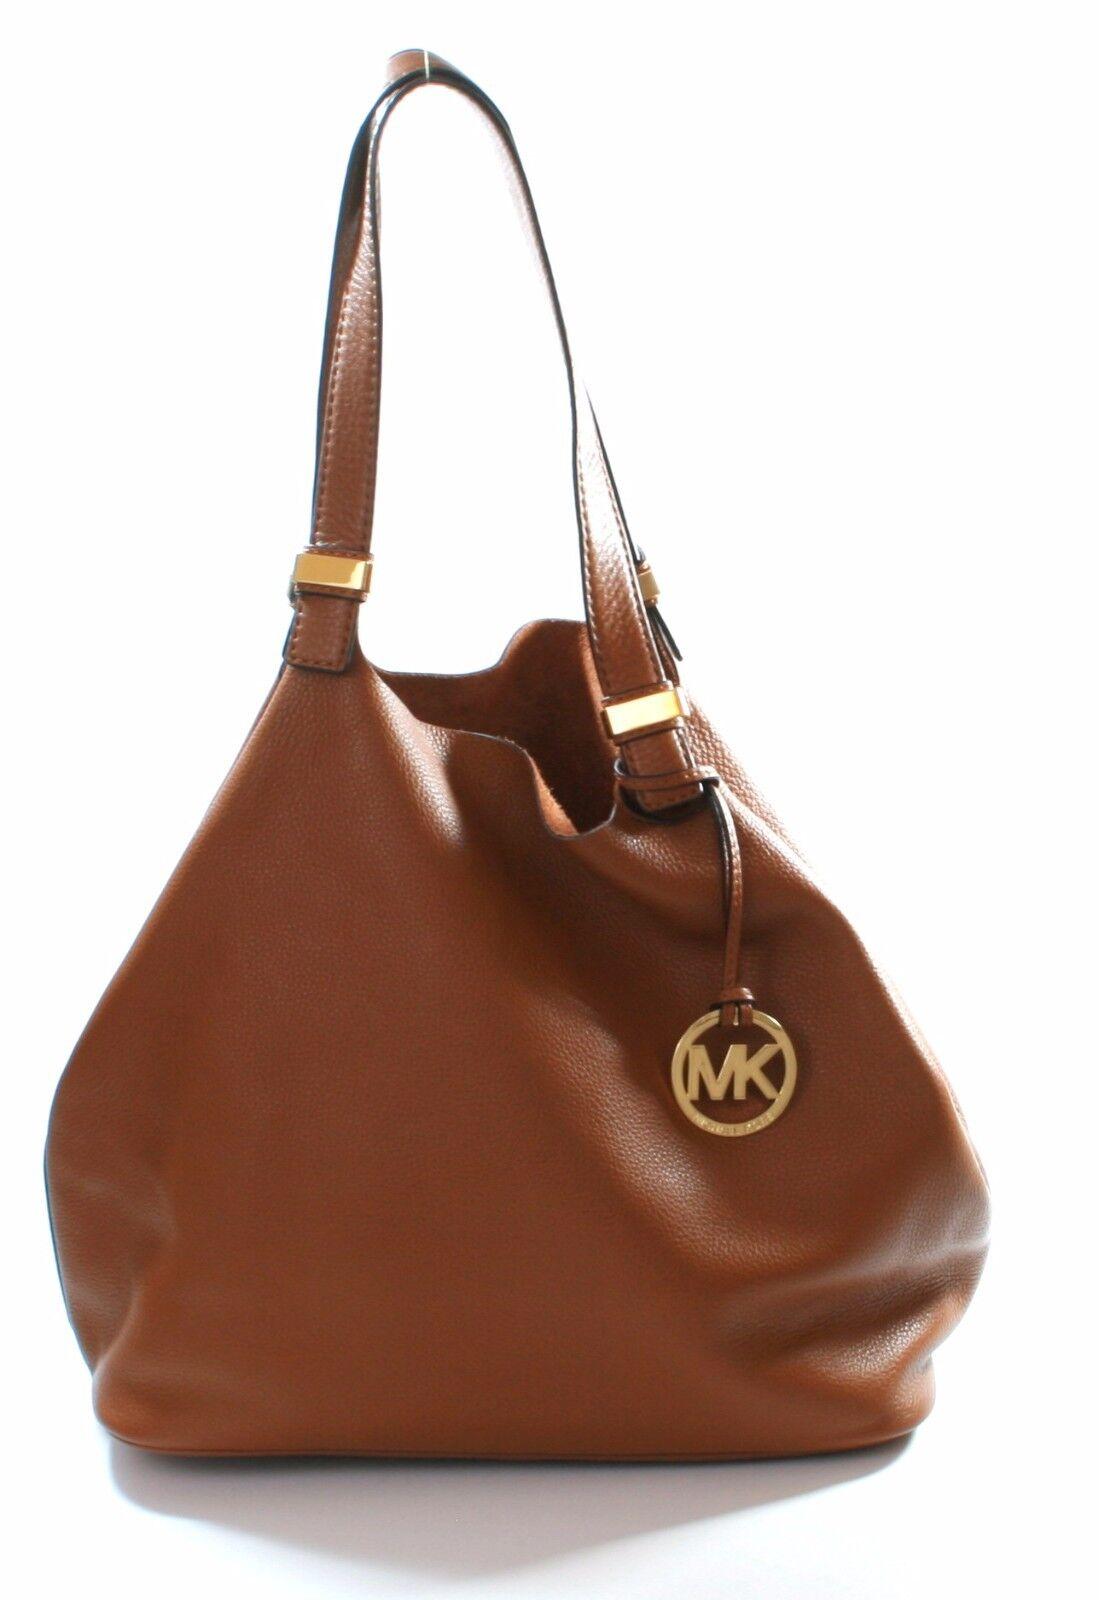 86d814ace1a1a2 ... UPC 885949832086 product image for Michael Kors Leather Colgate Hobo  Shoulder Bag Tan Brown Reversible